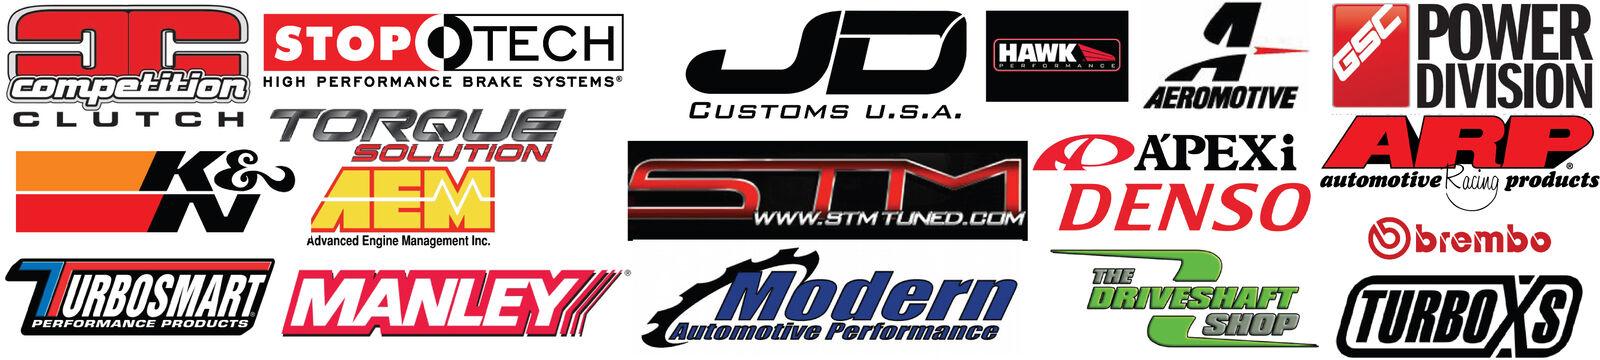 JD Customs USA